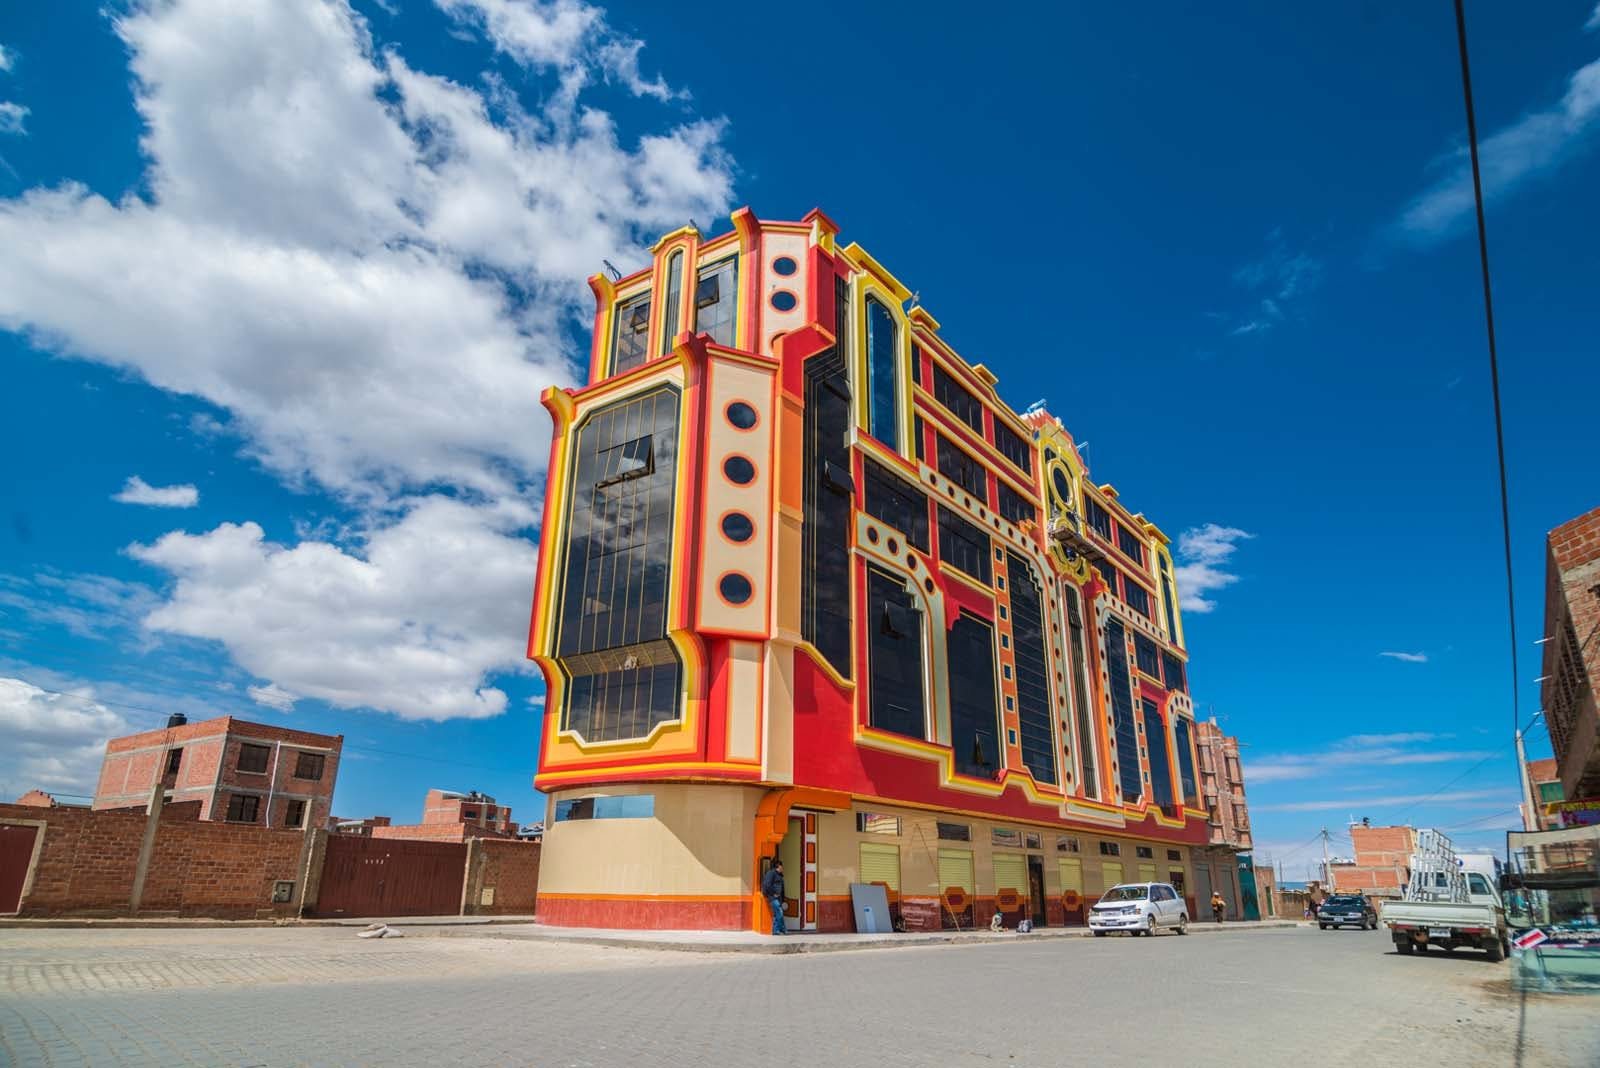 This Bolivian architecture is amazingly futuristic